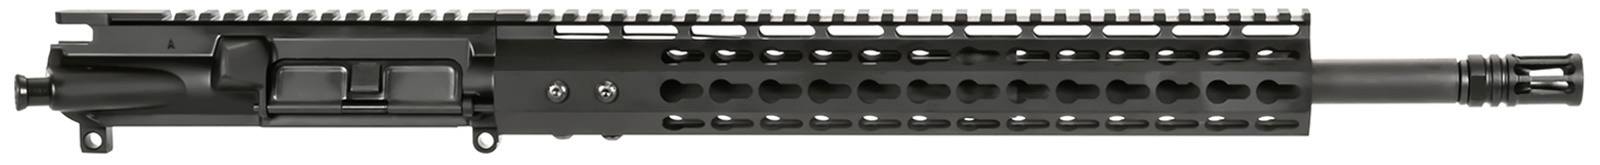 ar-15-upper-assembly-16-5-56-x-45-15-cbc-arms-keymod-gen-2-ar-15-handguard-rail-4